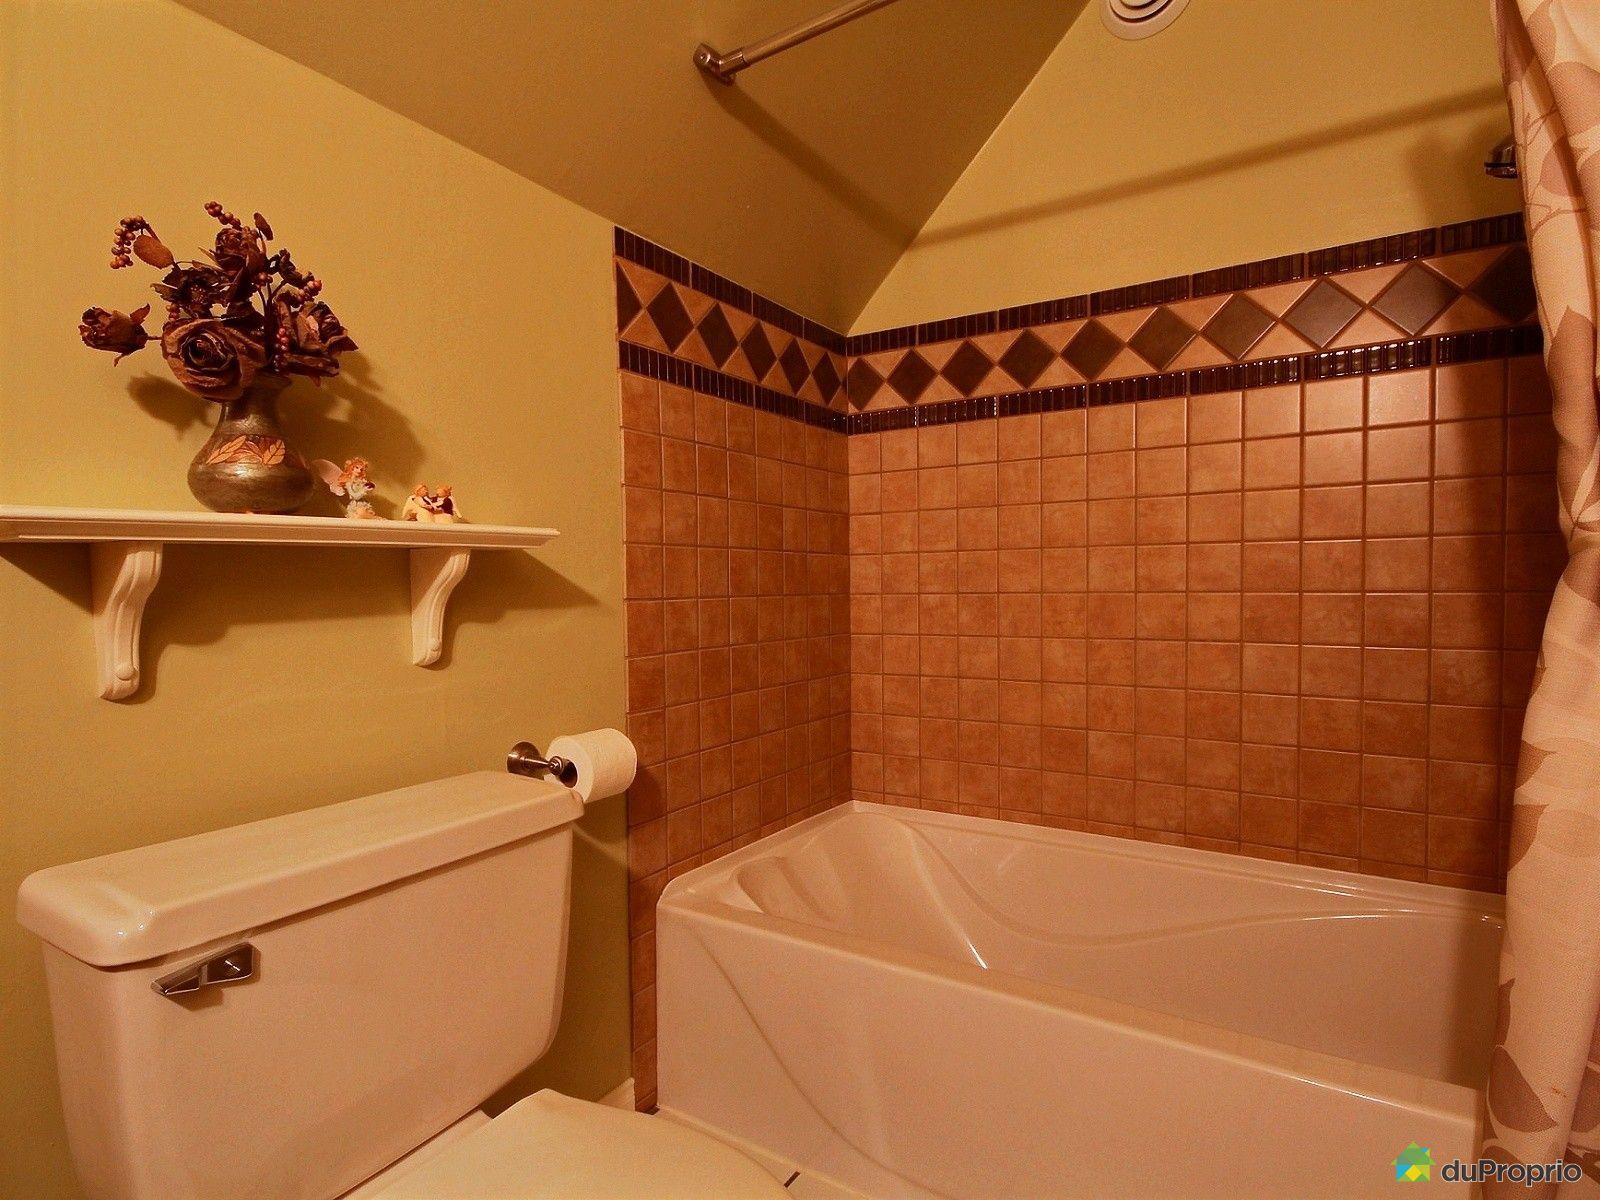 maison vendre dolbeau mistassini 388 rue bossuet immobilier qu bec duproprio 678930. Black Bedroom Furniture Sets. Home Design Ideas